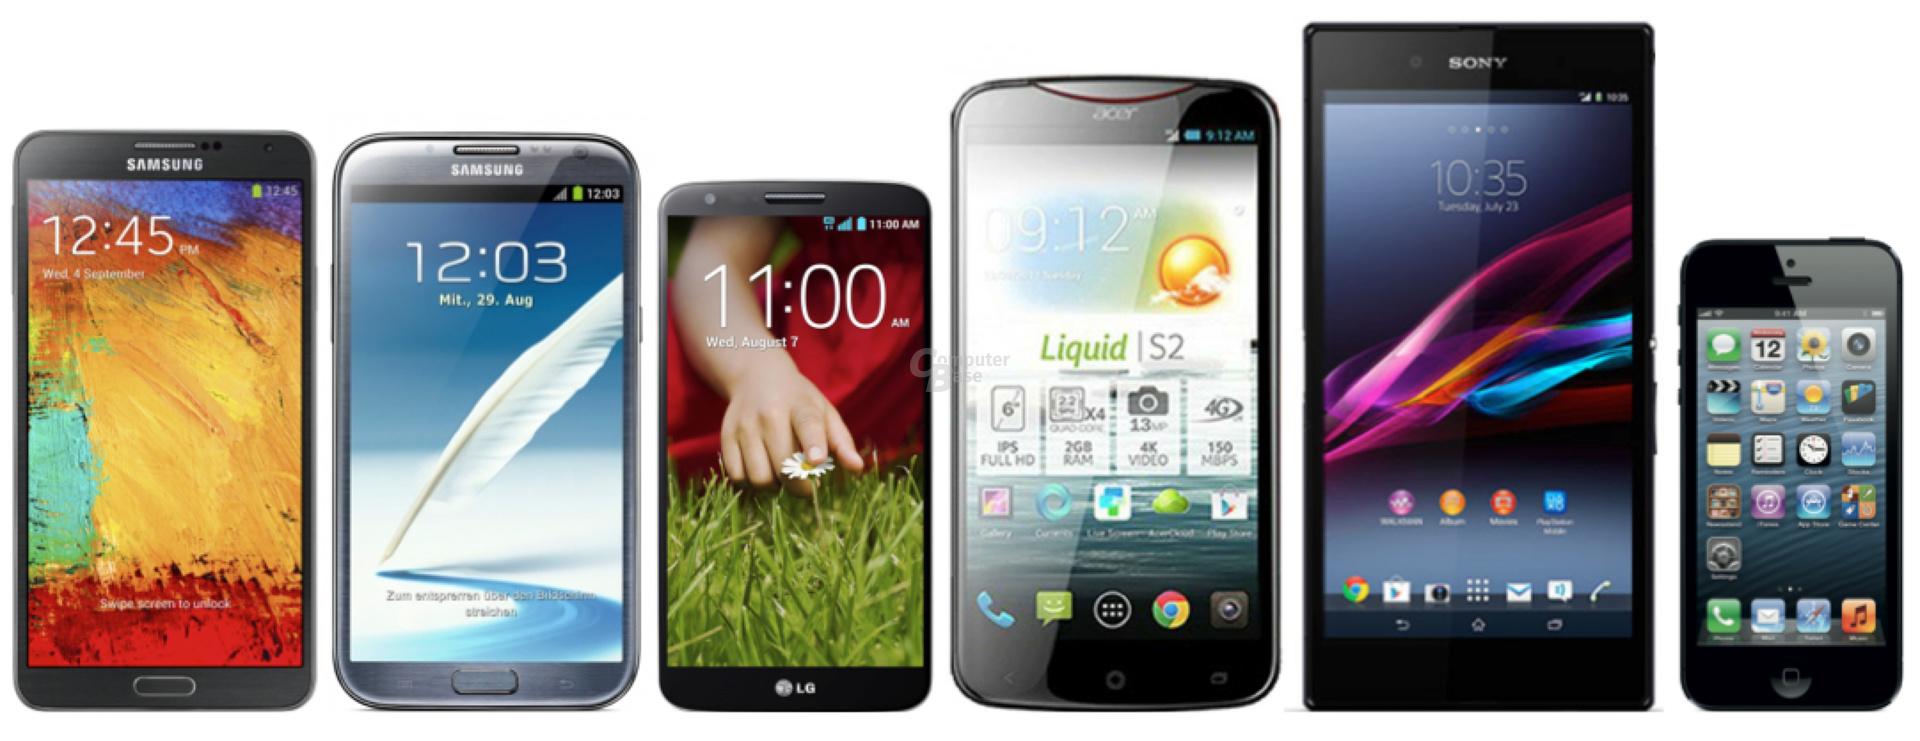 Samsung Galaxy Note 3, Note II, LG G2, Acer Liquid S2, Sony Xperia Z Ultra und Apple iPhone 5 (v.l.n.r.)